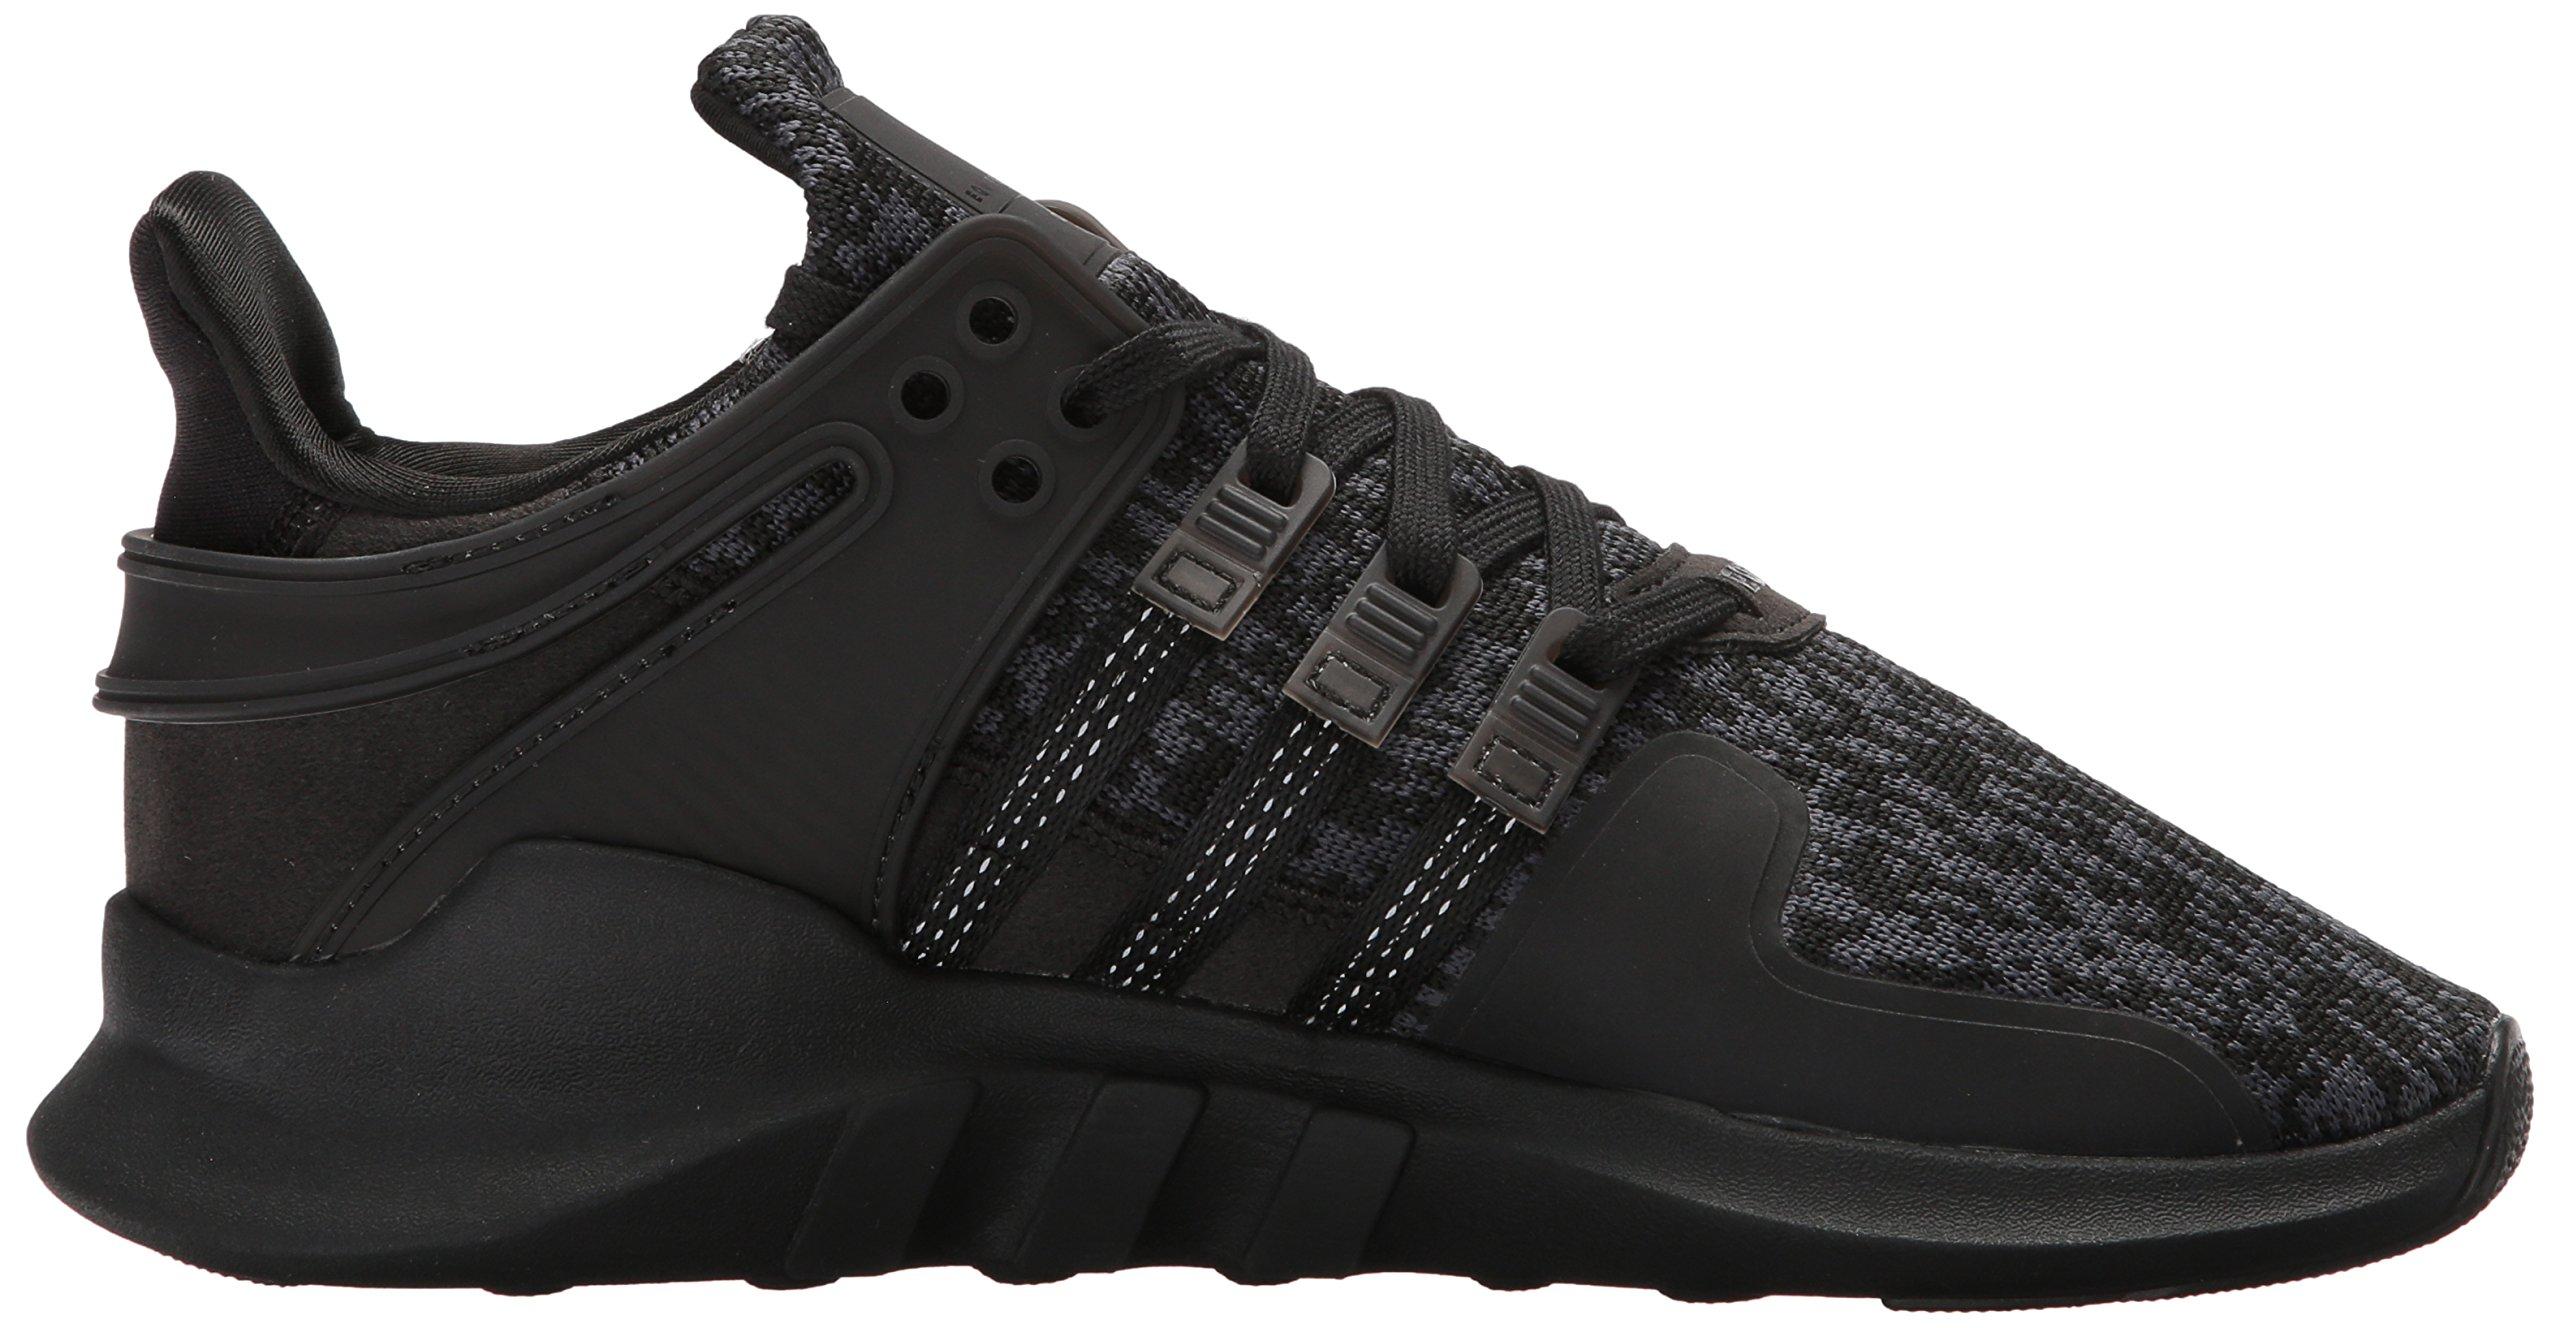 adidas Originals Boys' EQT Support ADV J Running Shoe, Black, 6.5 M US Big Kid by adidas Originals (Image #9)